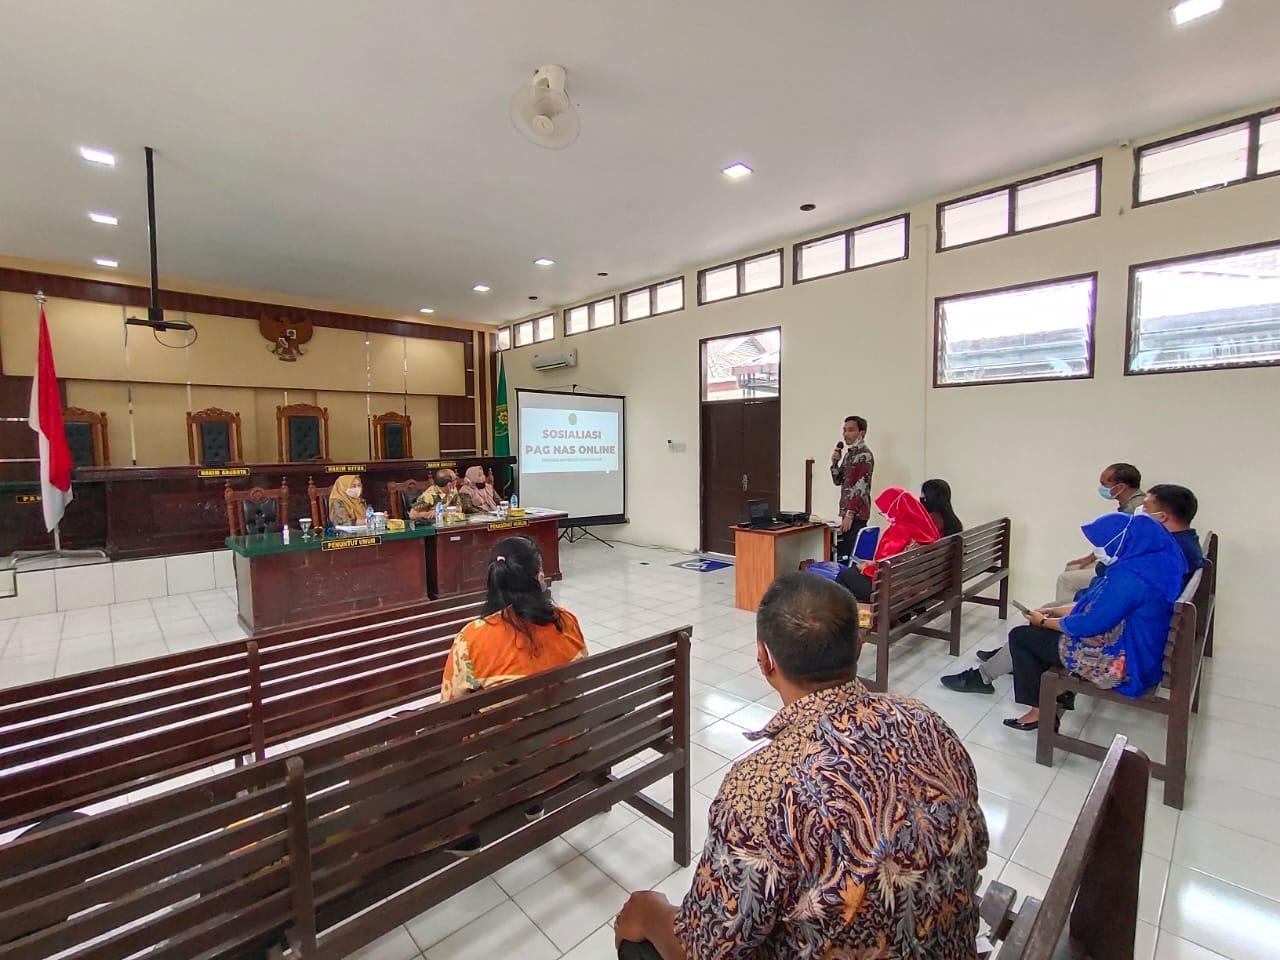 Rapat Sosialisasi Inovasi PAG NAS Online Pengadilan Negeri Simalungun